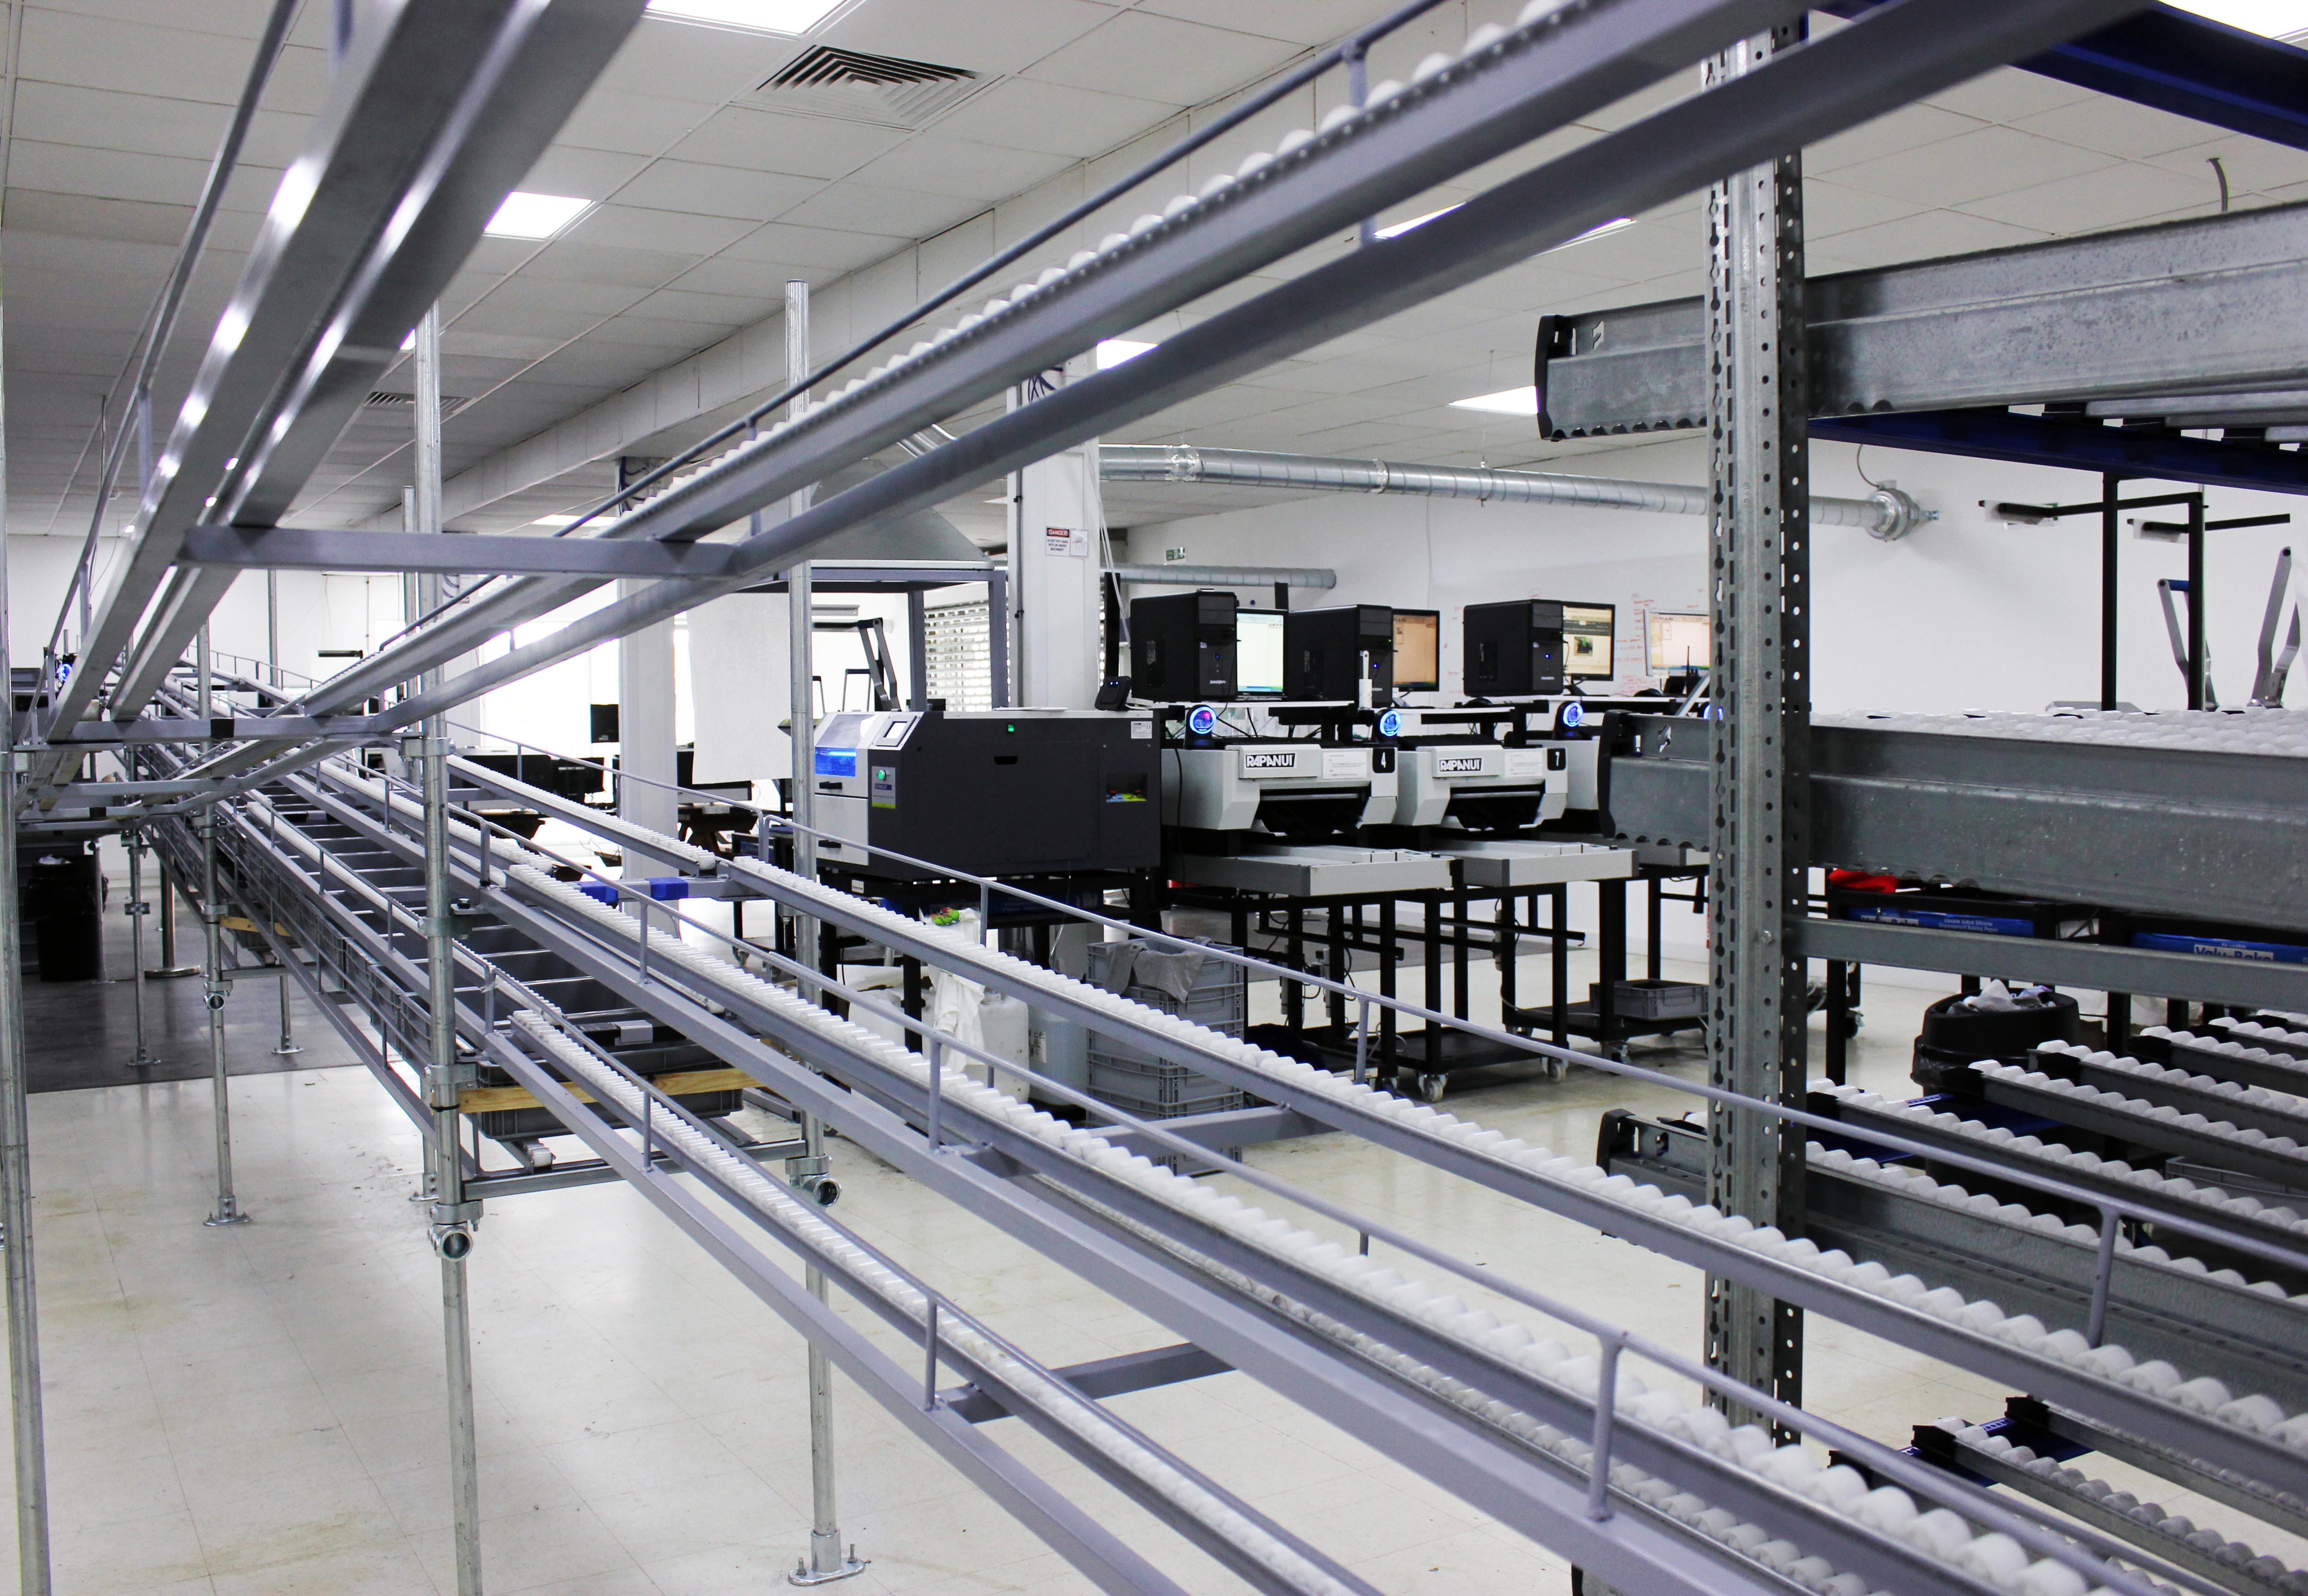 Teemill factory